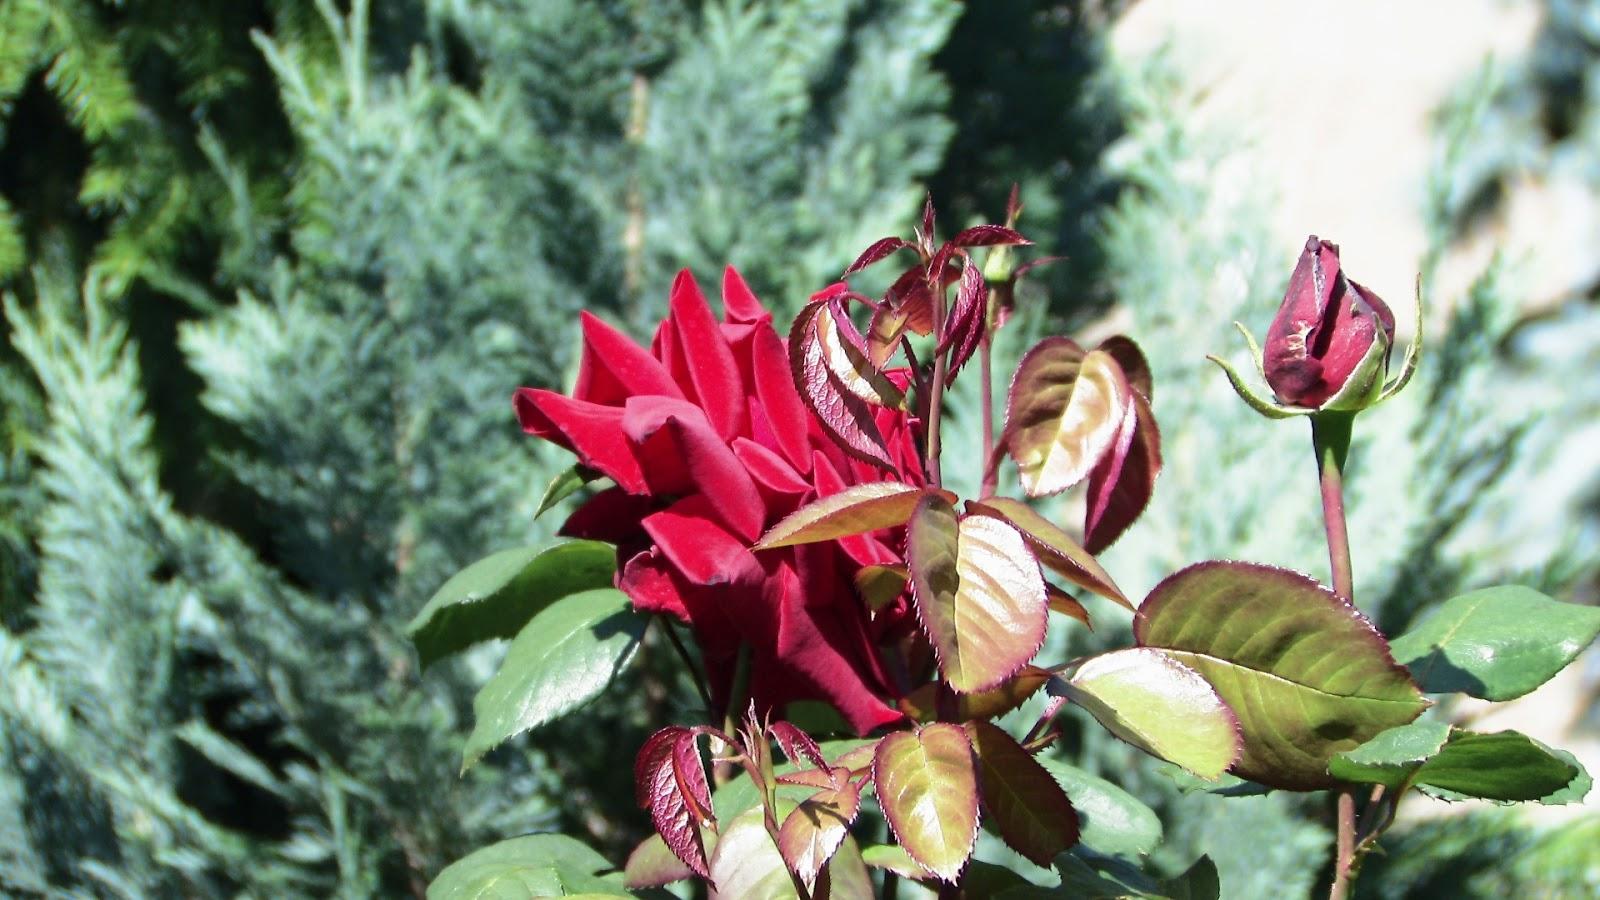 www.seeik.pl galeria róża